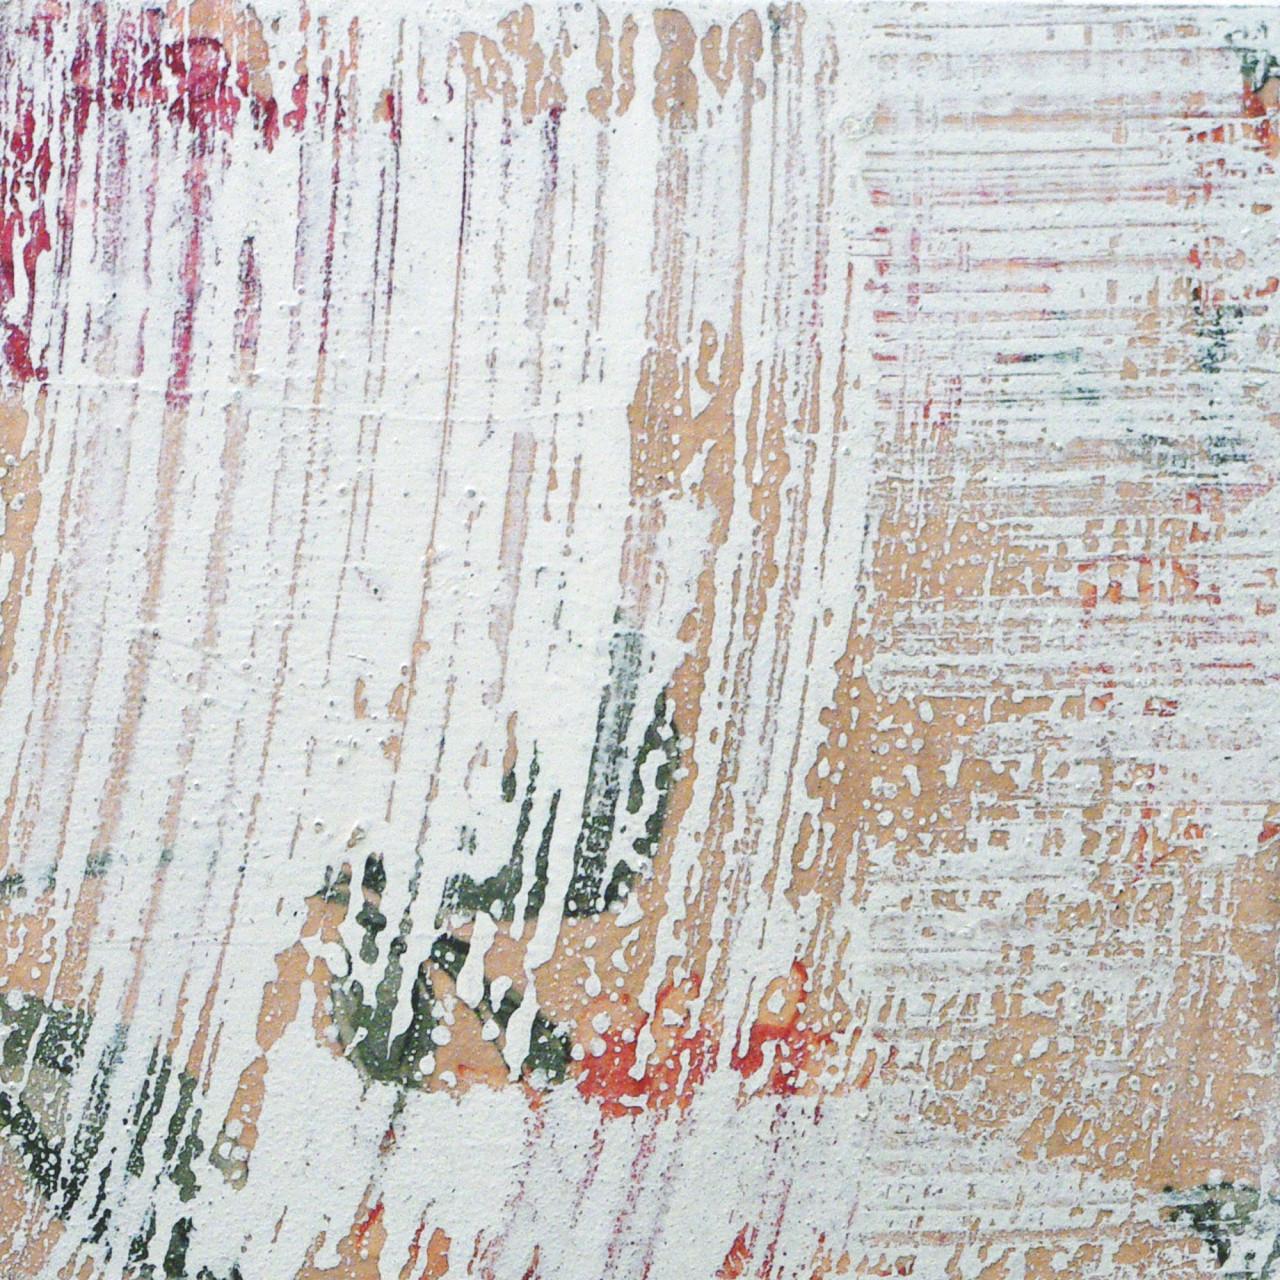 623.7, 2015 tecnica mista su tavola 23x23 cm